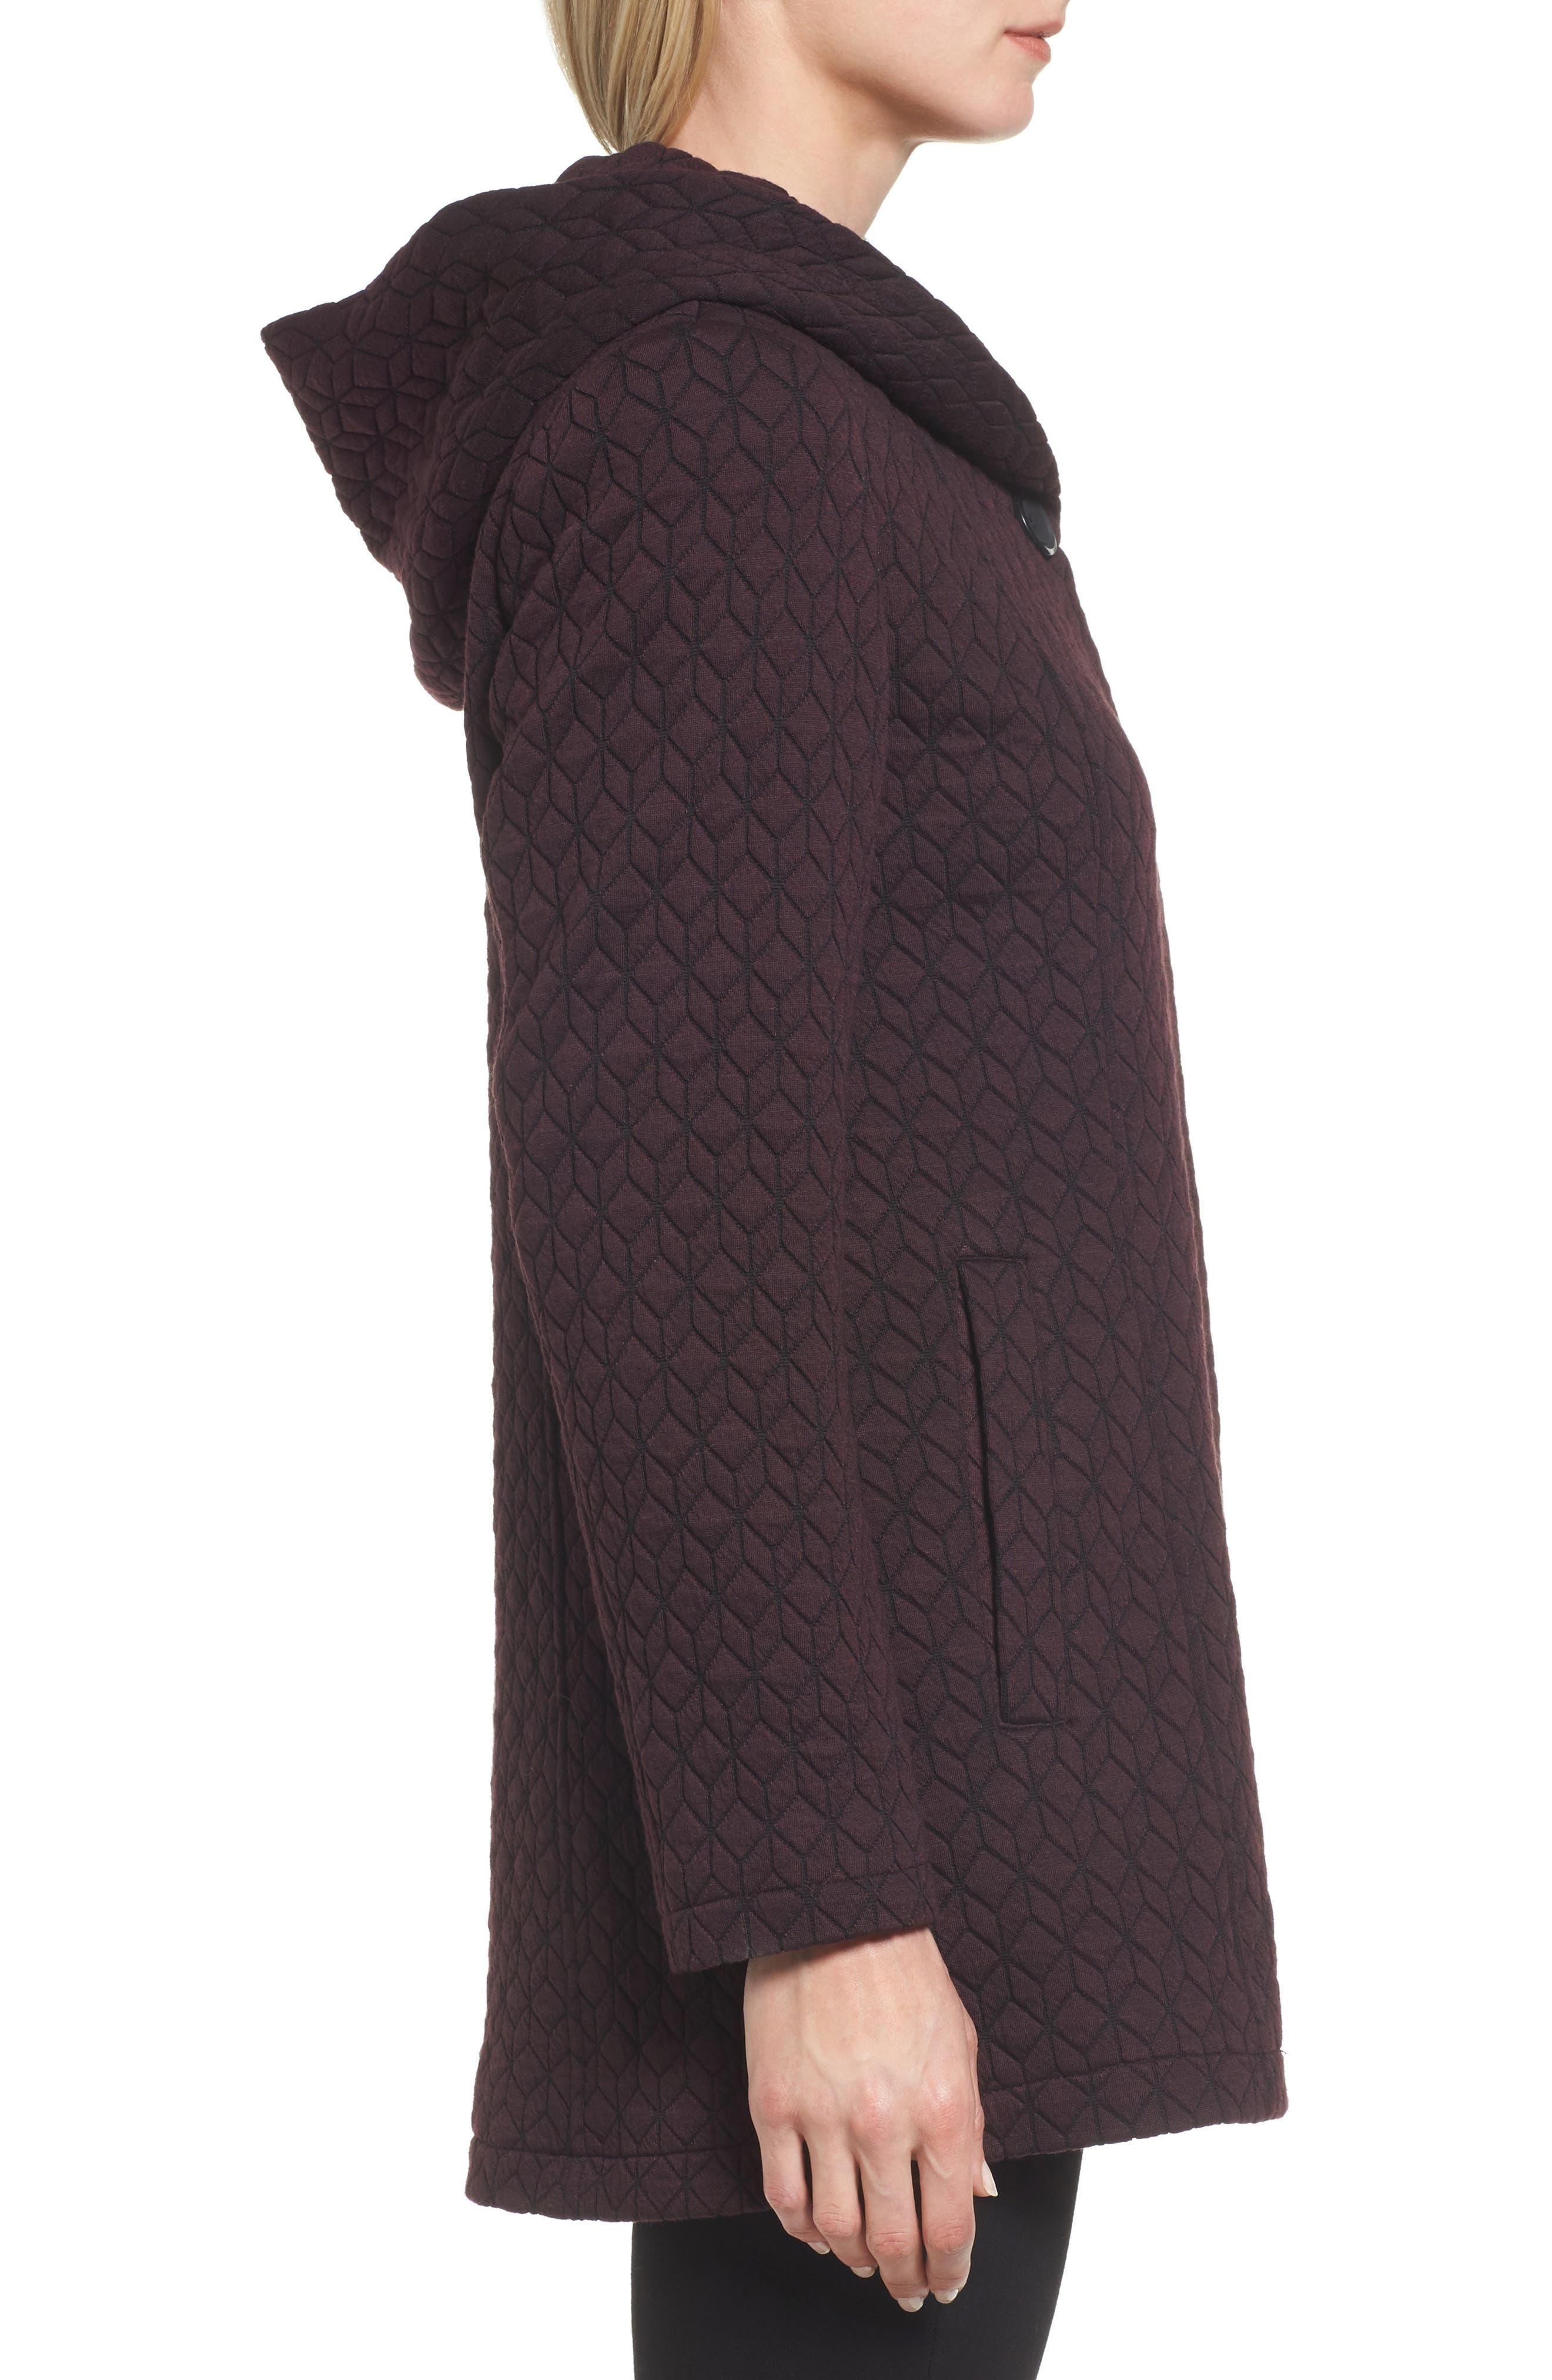 Cozy Knit Coat,                             Alternate thumbnail 3, color,                             Burgundy